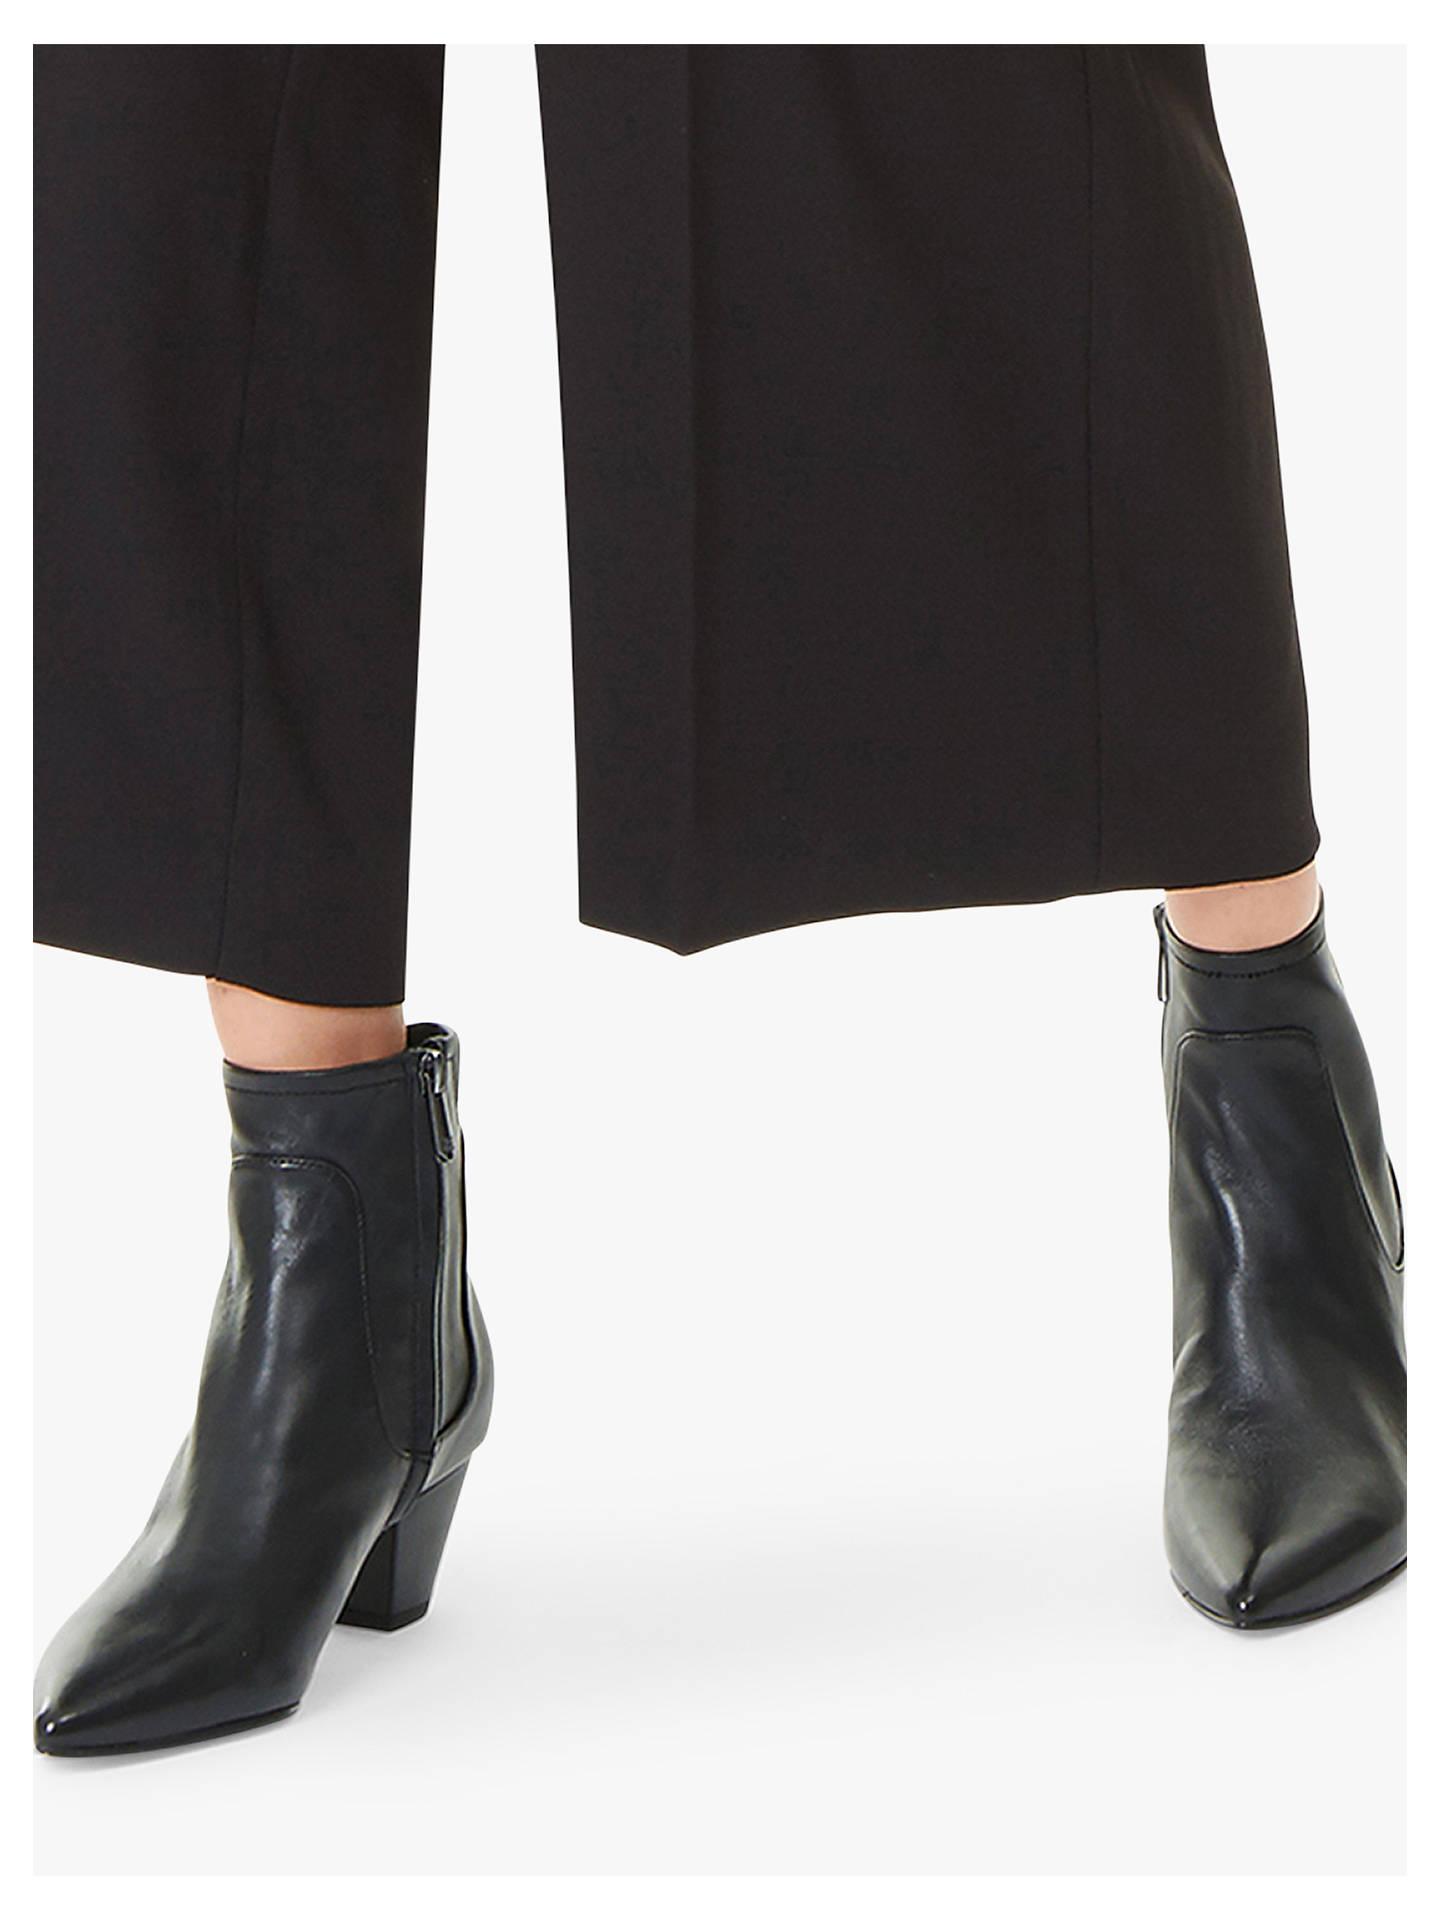 550f828a7dd22 ... Buy Sam Edelman Karlee Ankle Boots